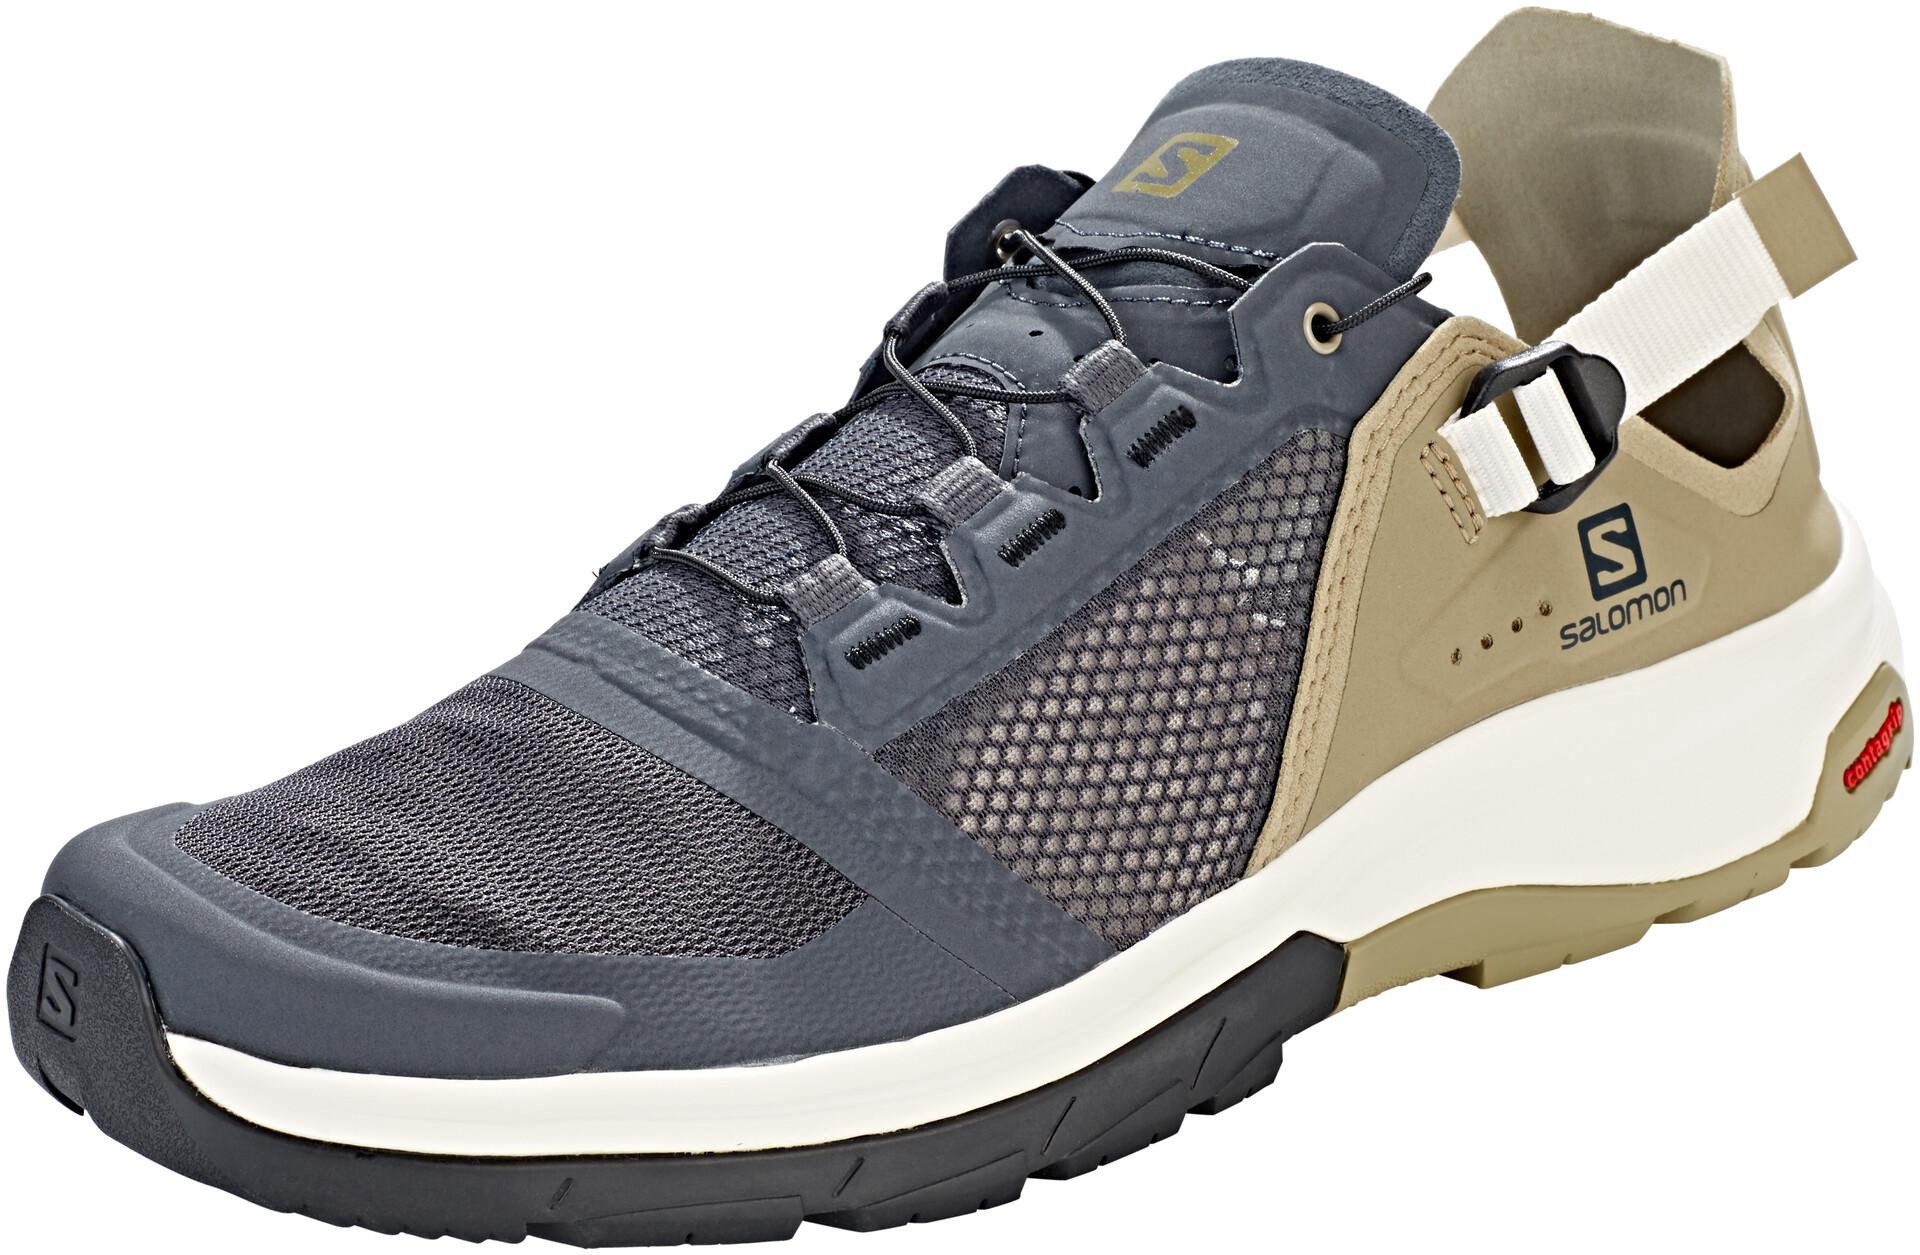 Salomon Techamphibian 4 Shoes Herren ebonymermaidvanilla ice